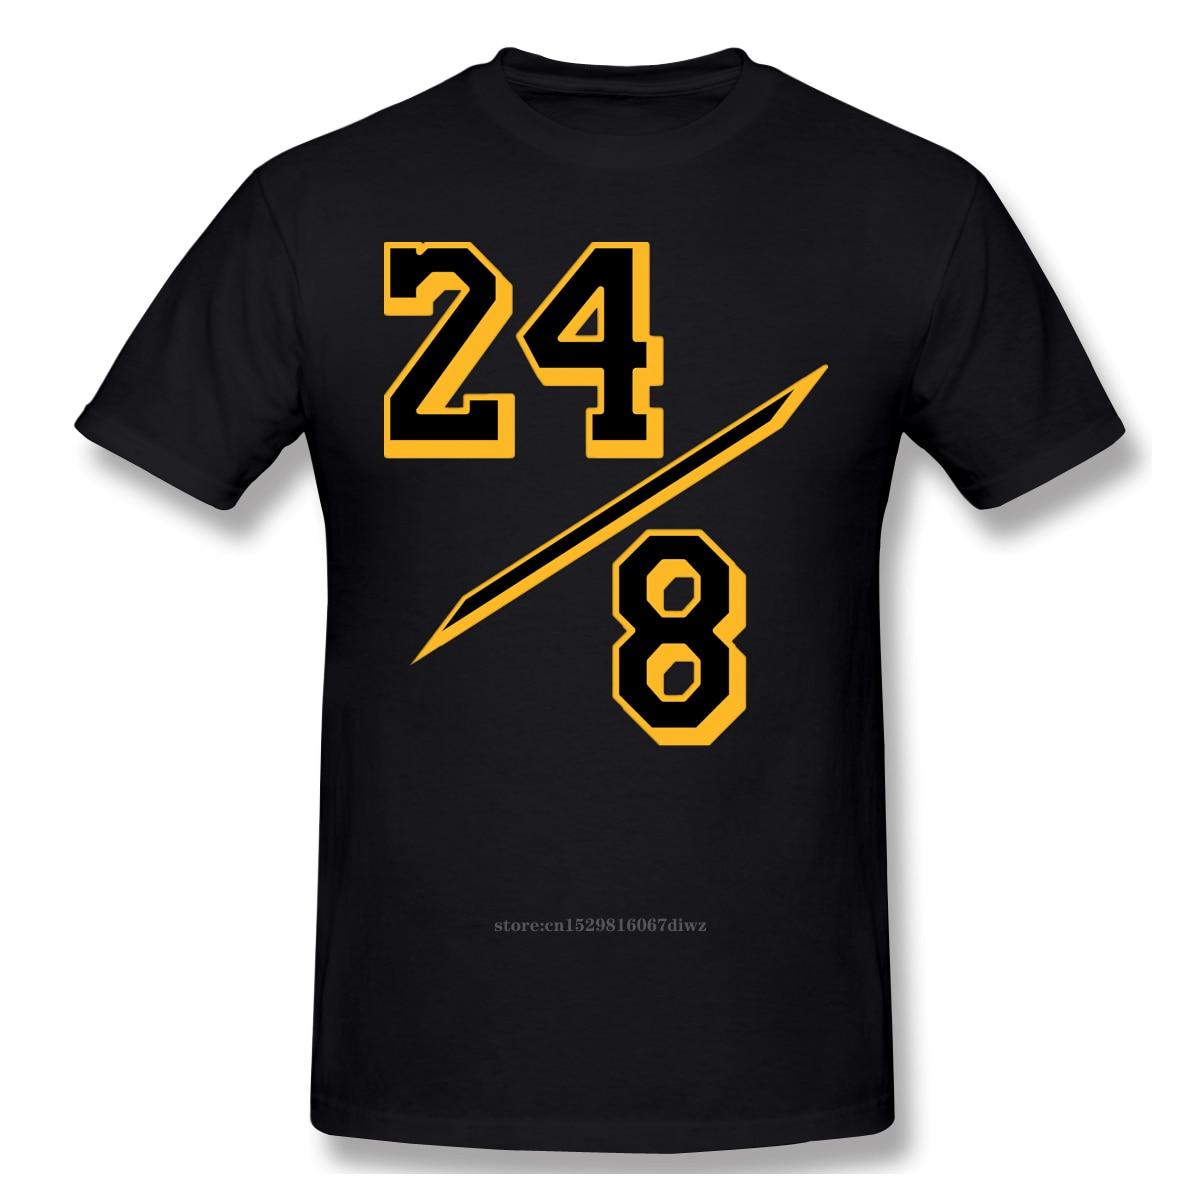 24 - 8 Number Print New Summer Cotton Funny T Shirts Short Sleeves T-shirt Bryant Men Fashion Ofertas Streetwear